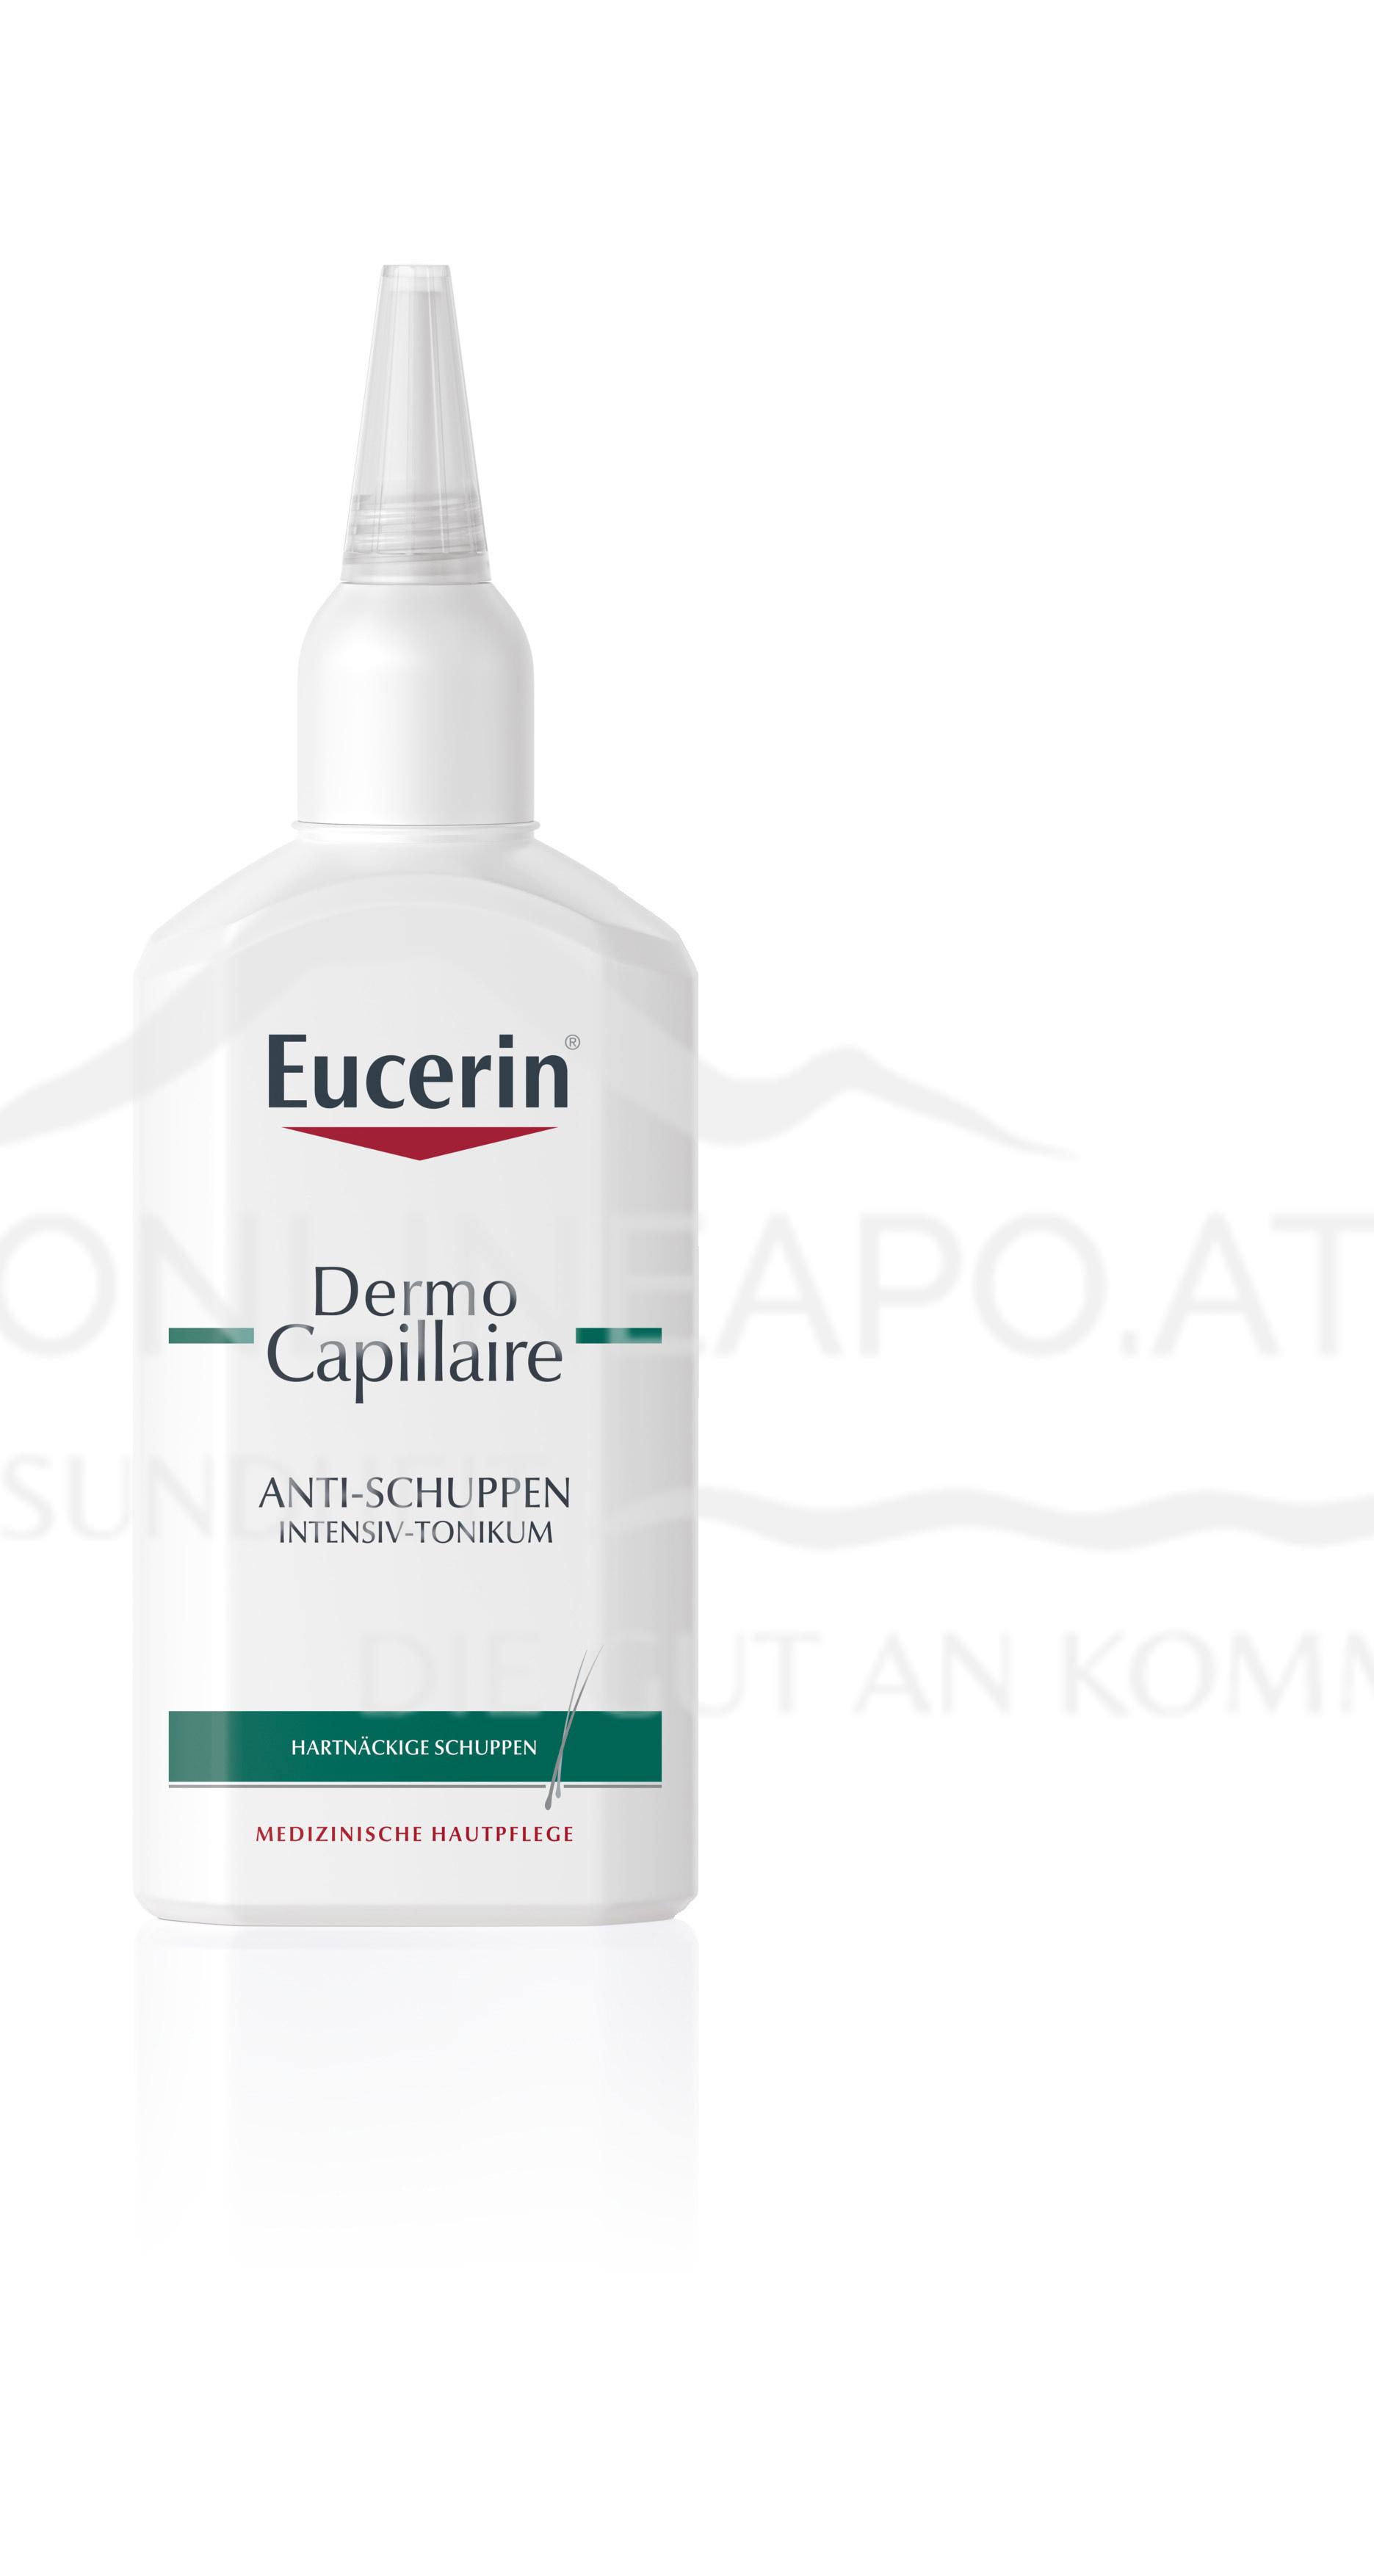 Eucerin DermoCapillaire Anti-Schuppen Intensiv-Tonikum